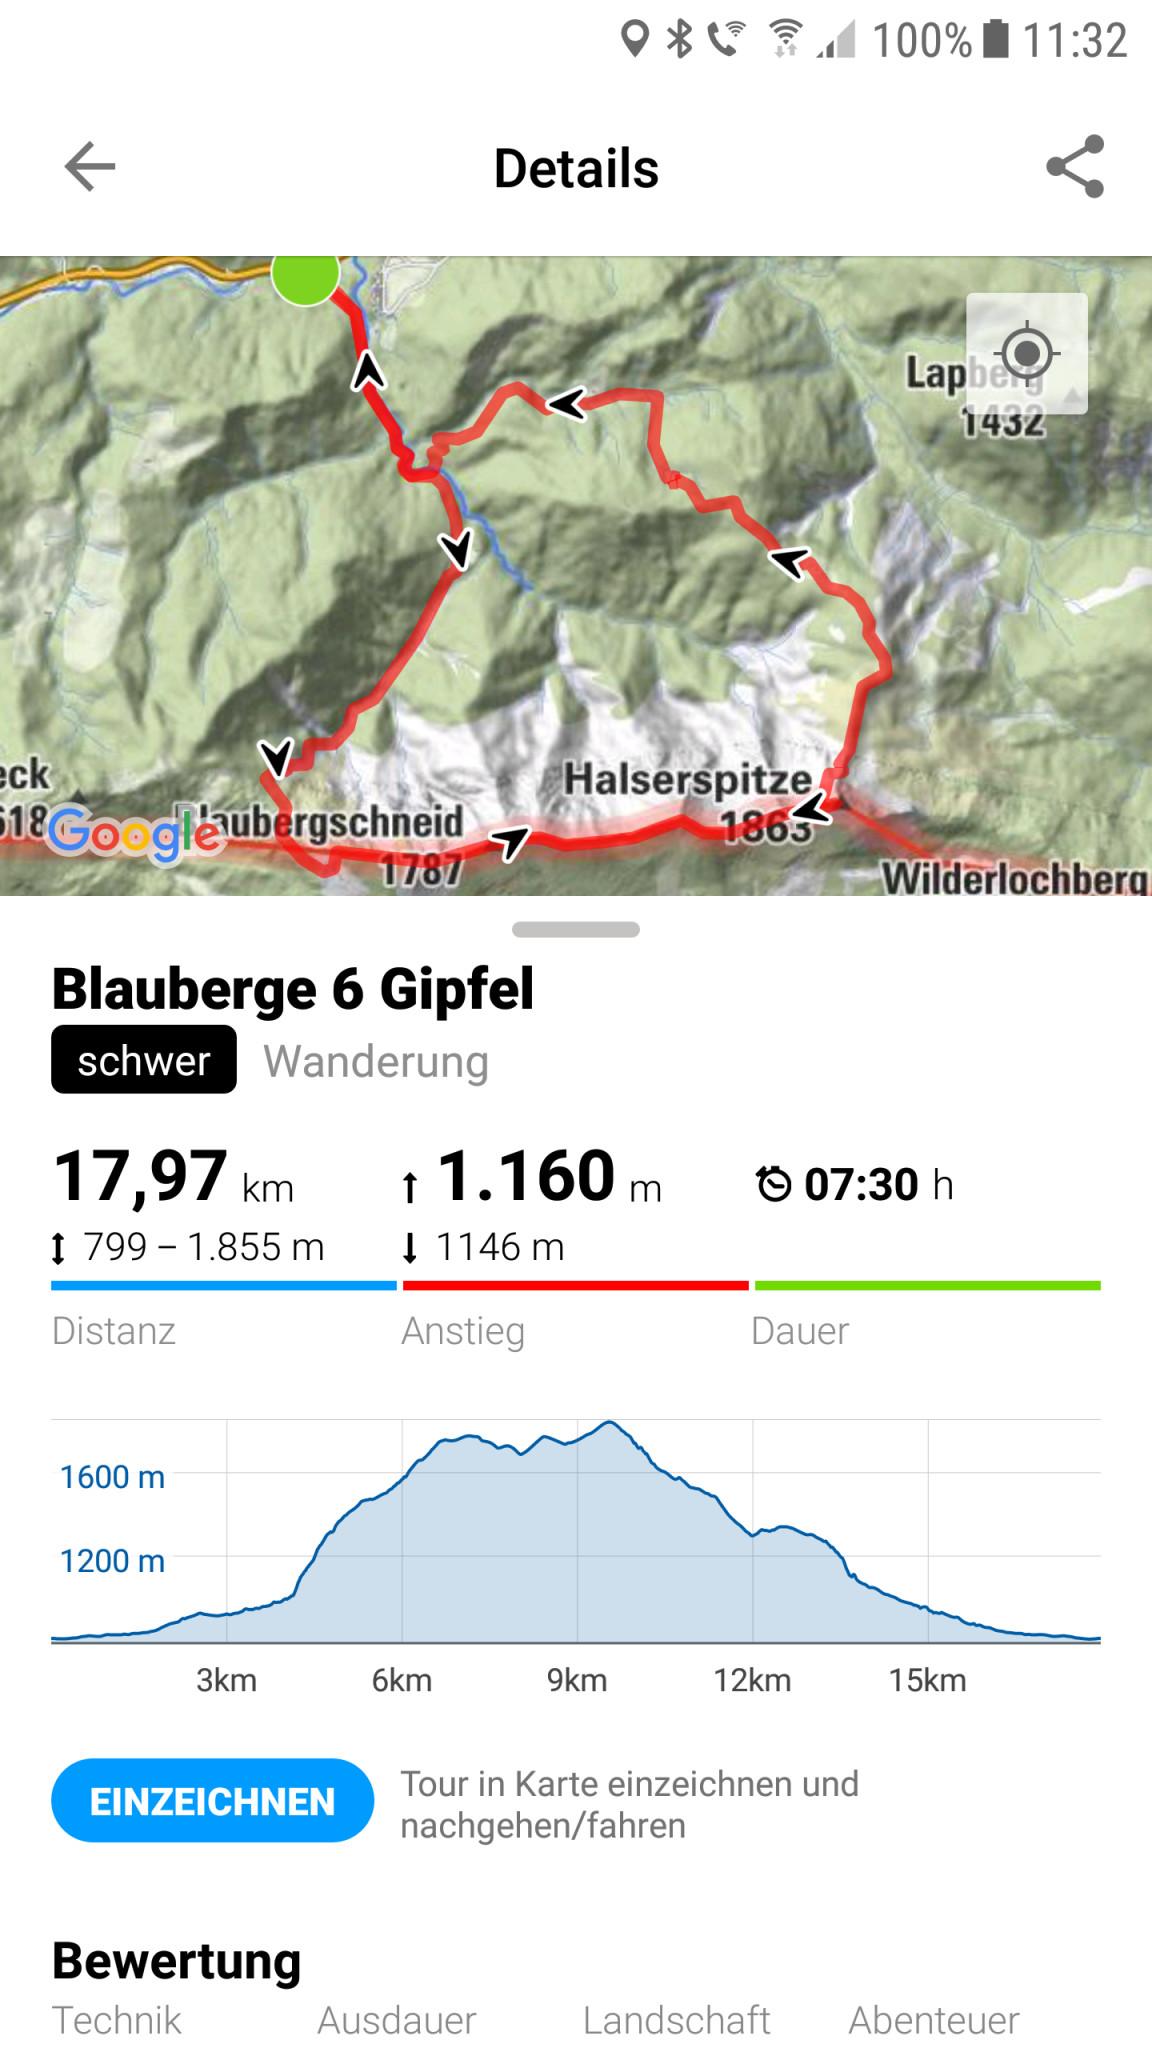 Screenshot 1 - Bergfex Touren & GPS-Tracking: Navi zum Wandern, Radfahren & Laufen (Android-App)